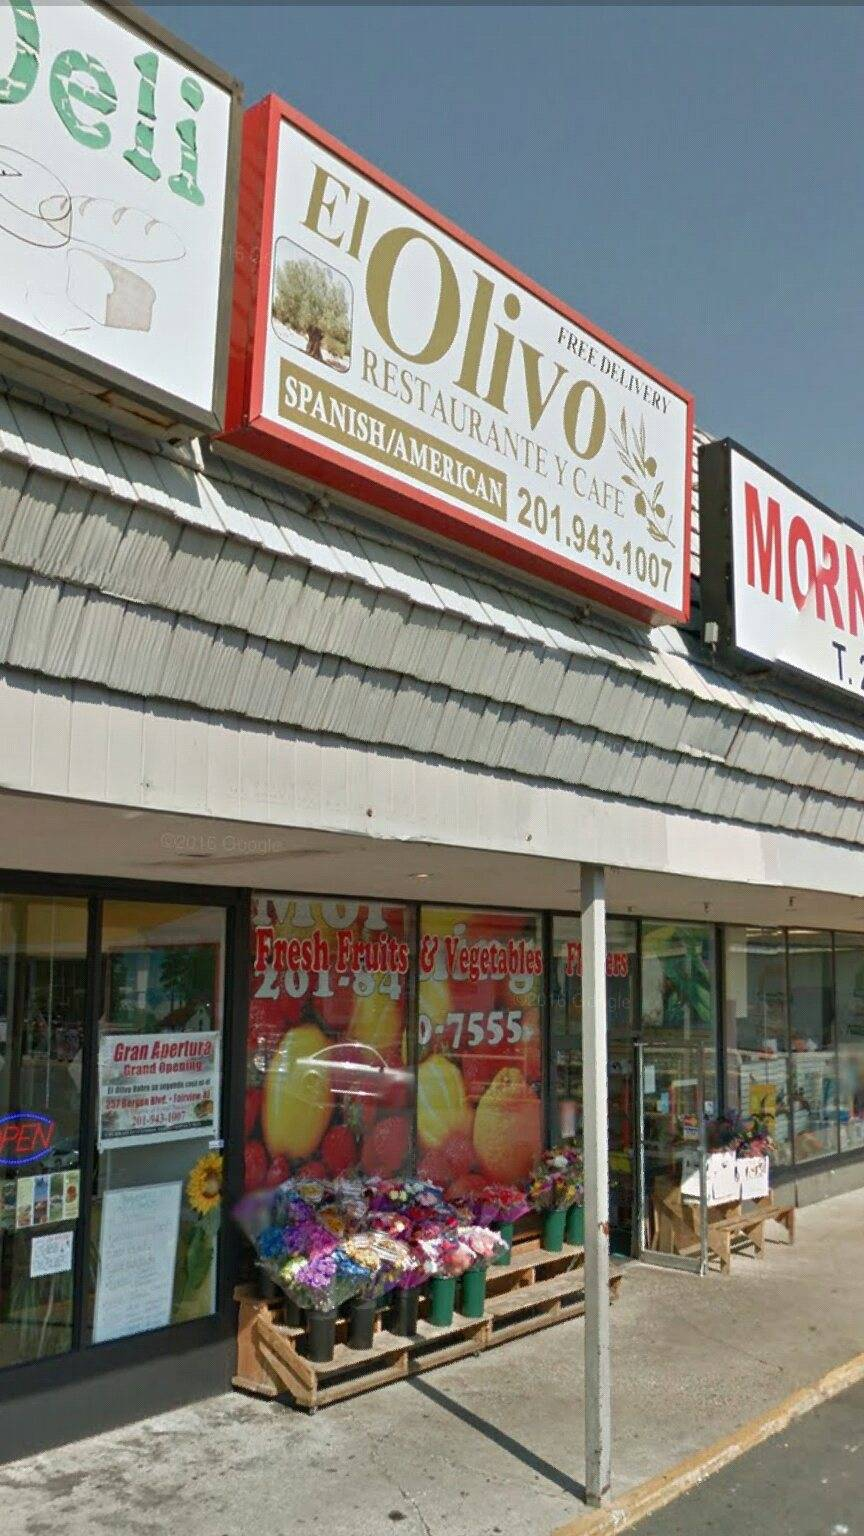 El Olivo   restaurant   257 Bergen Blvd, Fairview, NJ 07022, USA   2019431007 OR +1 201-943-1007